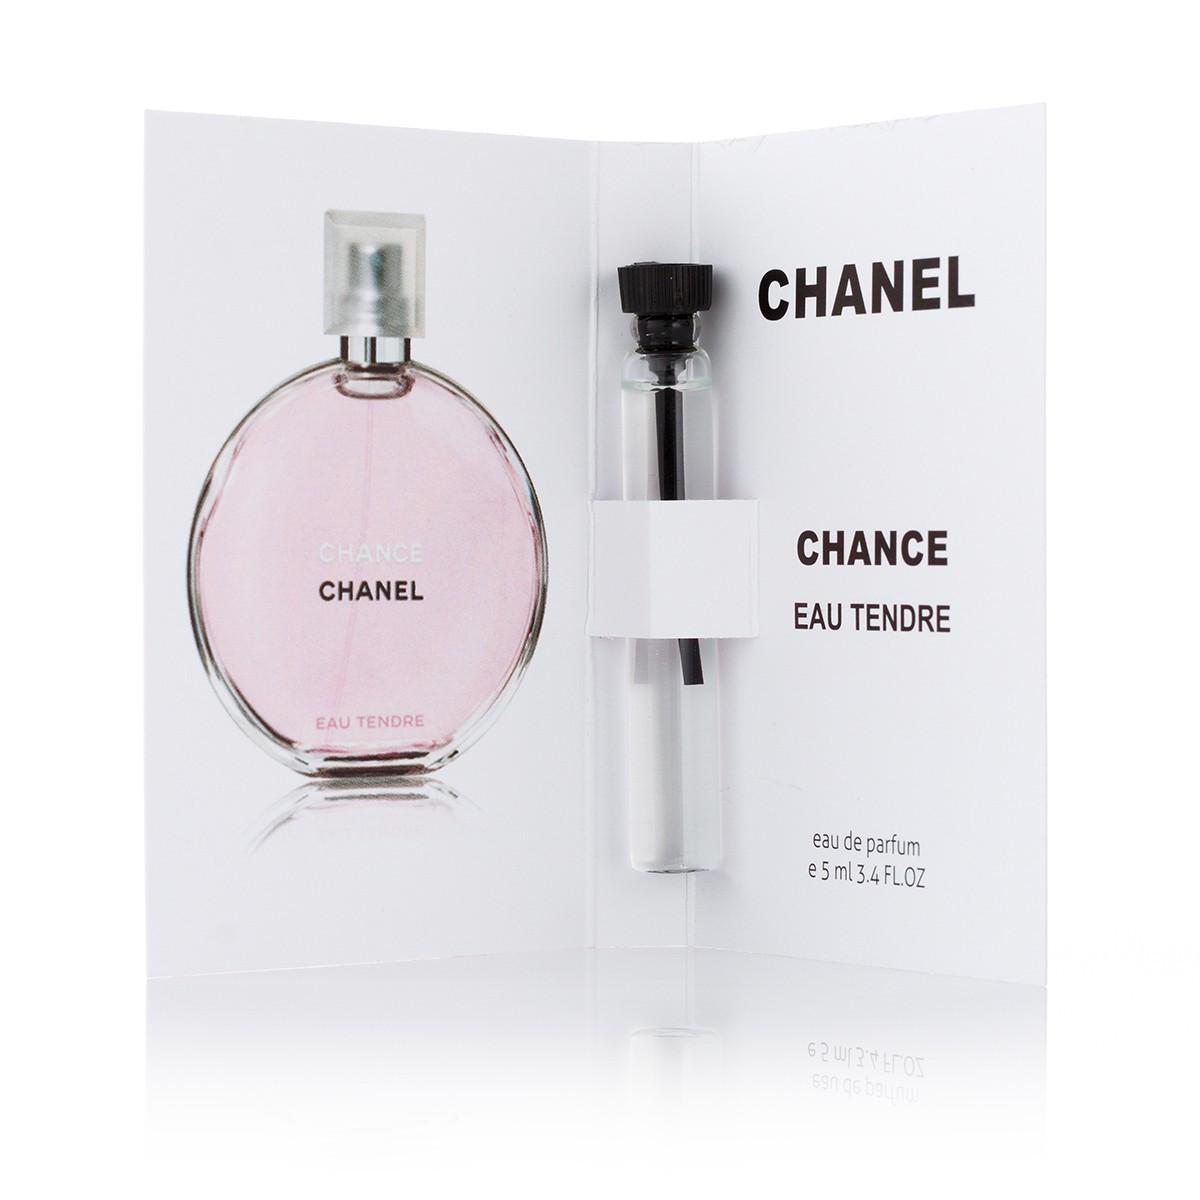 Chanel Chance Eau Tendre (ж) 5 ml